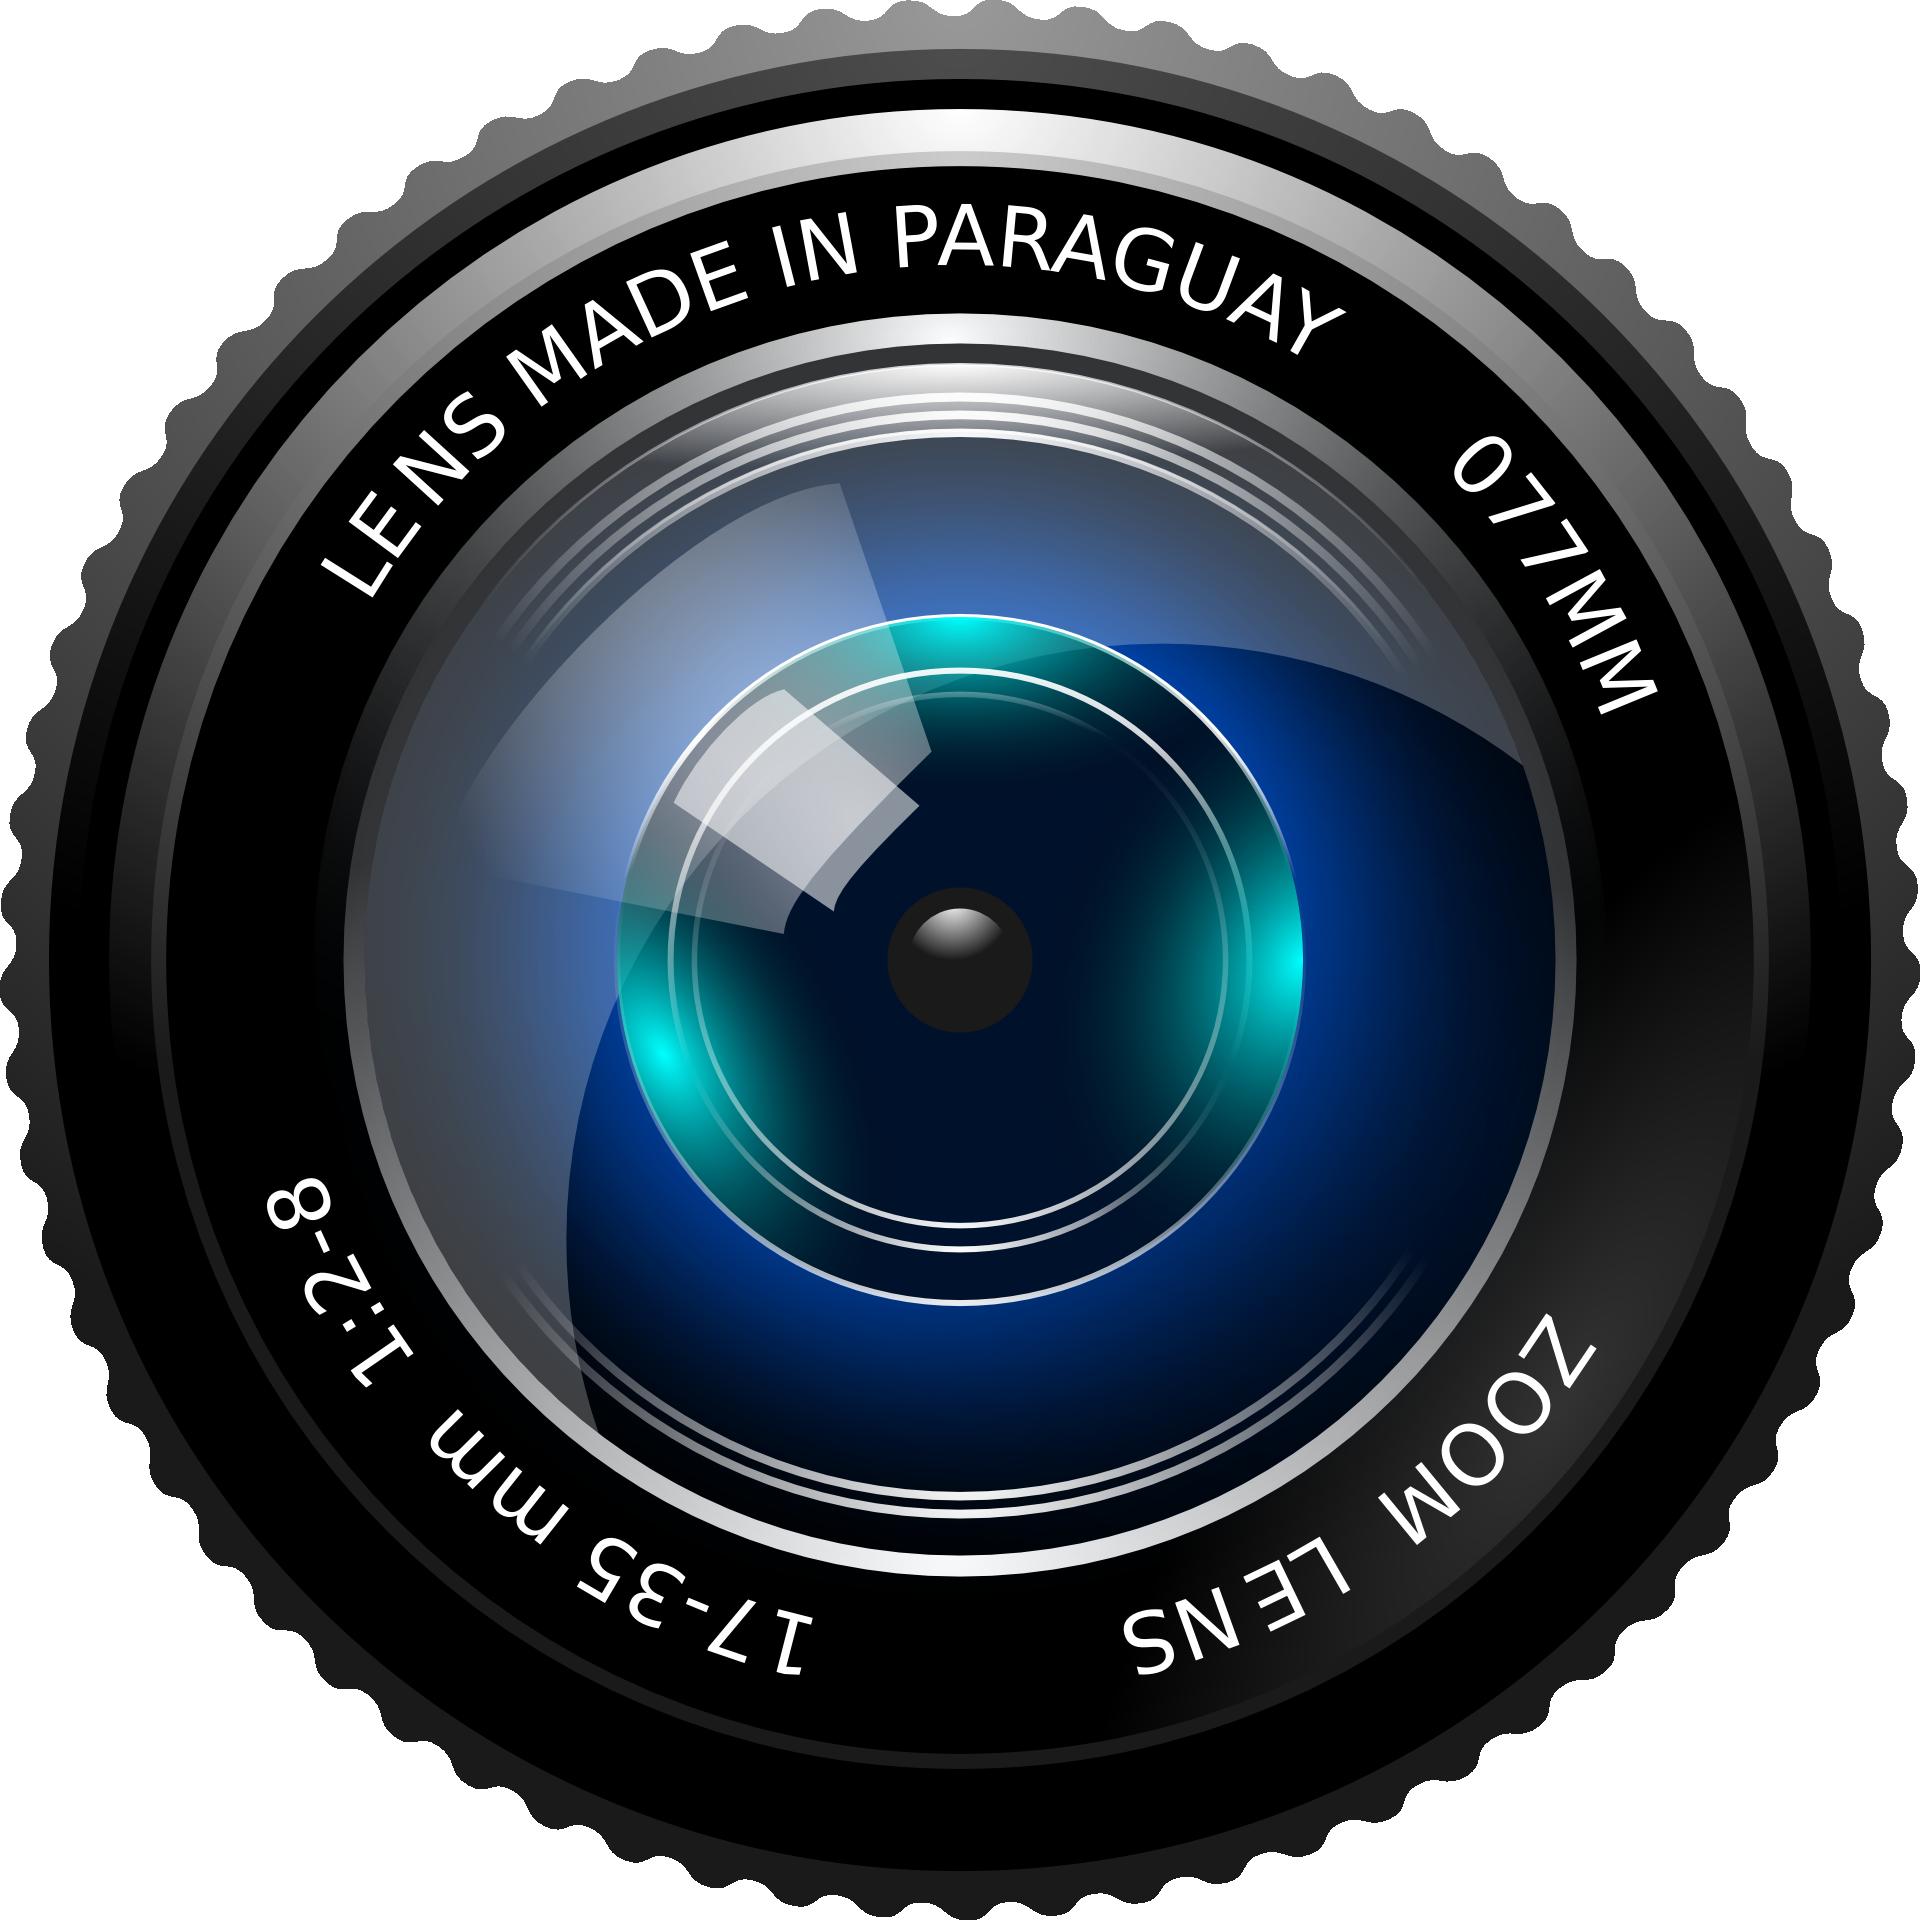 Camera lens image logo 7150 Free Transparent PNG Logos